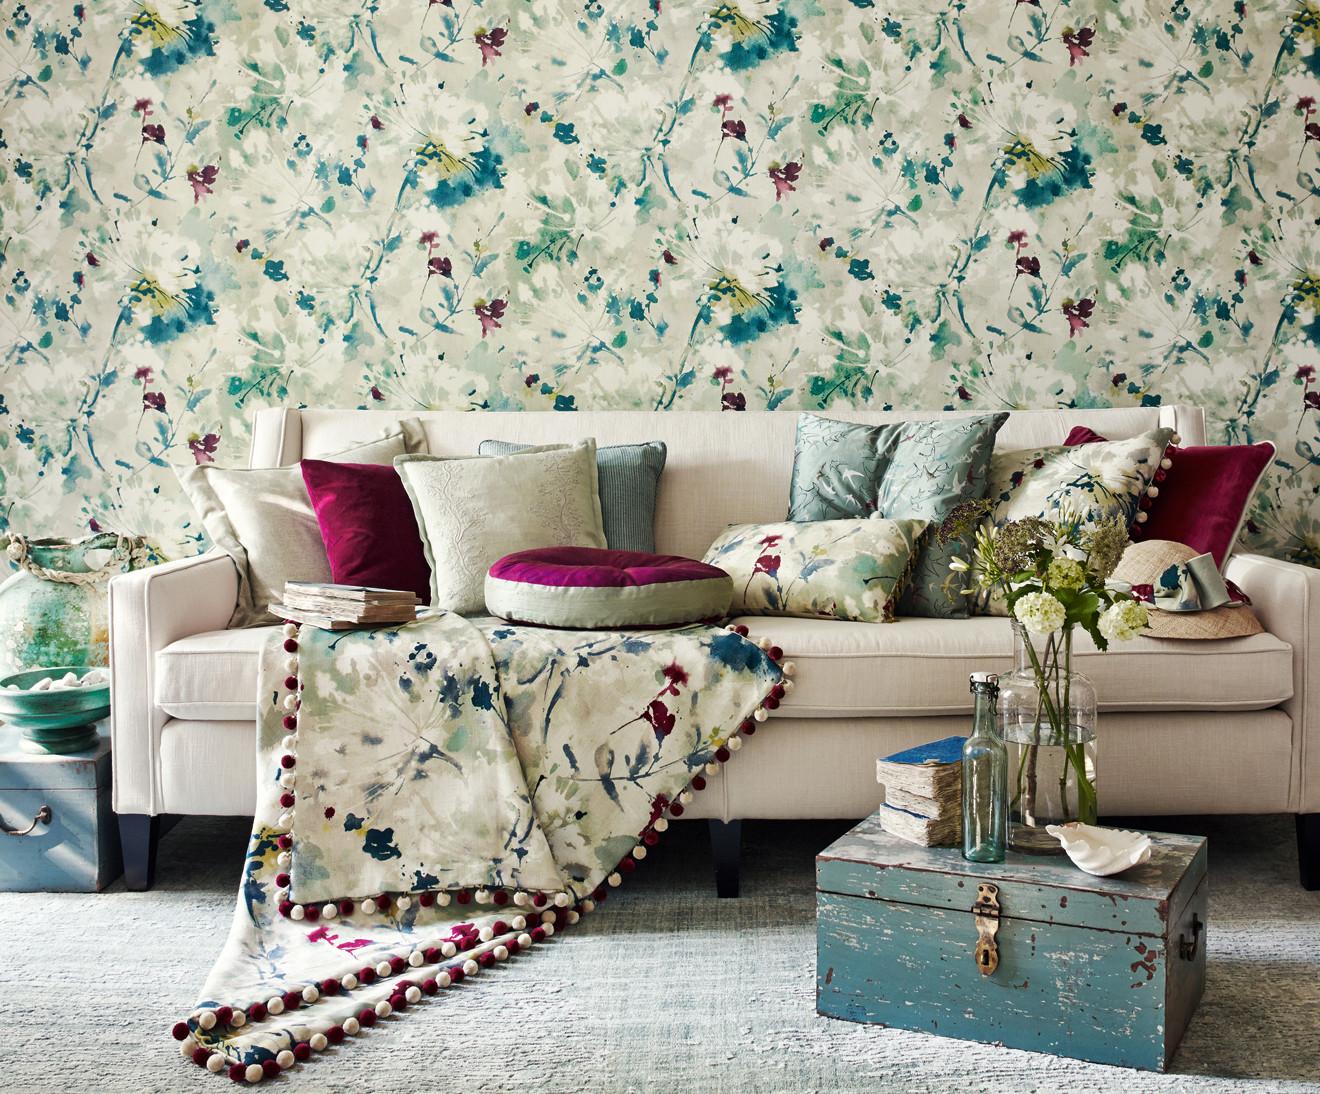 Simi wallpaper main_lr CROPPED.jpg